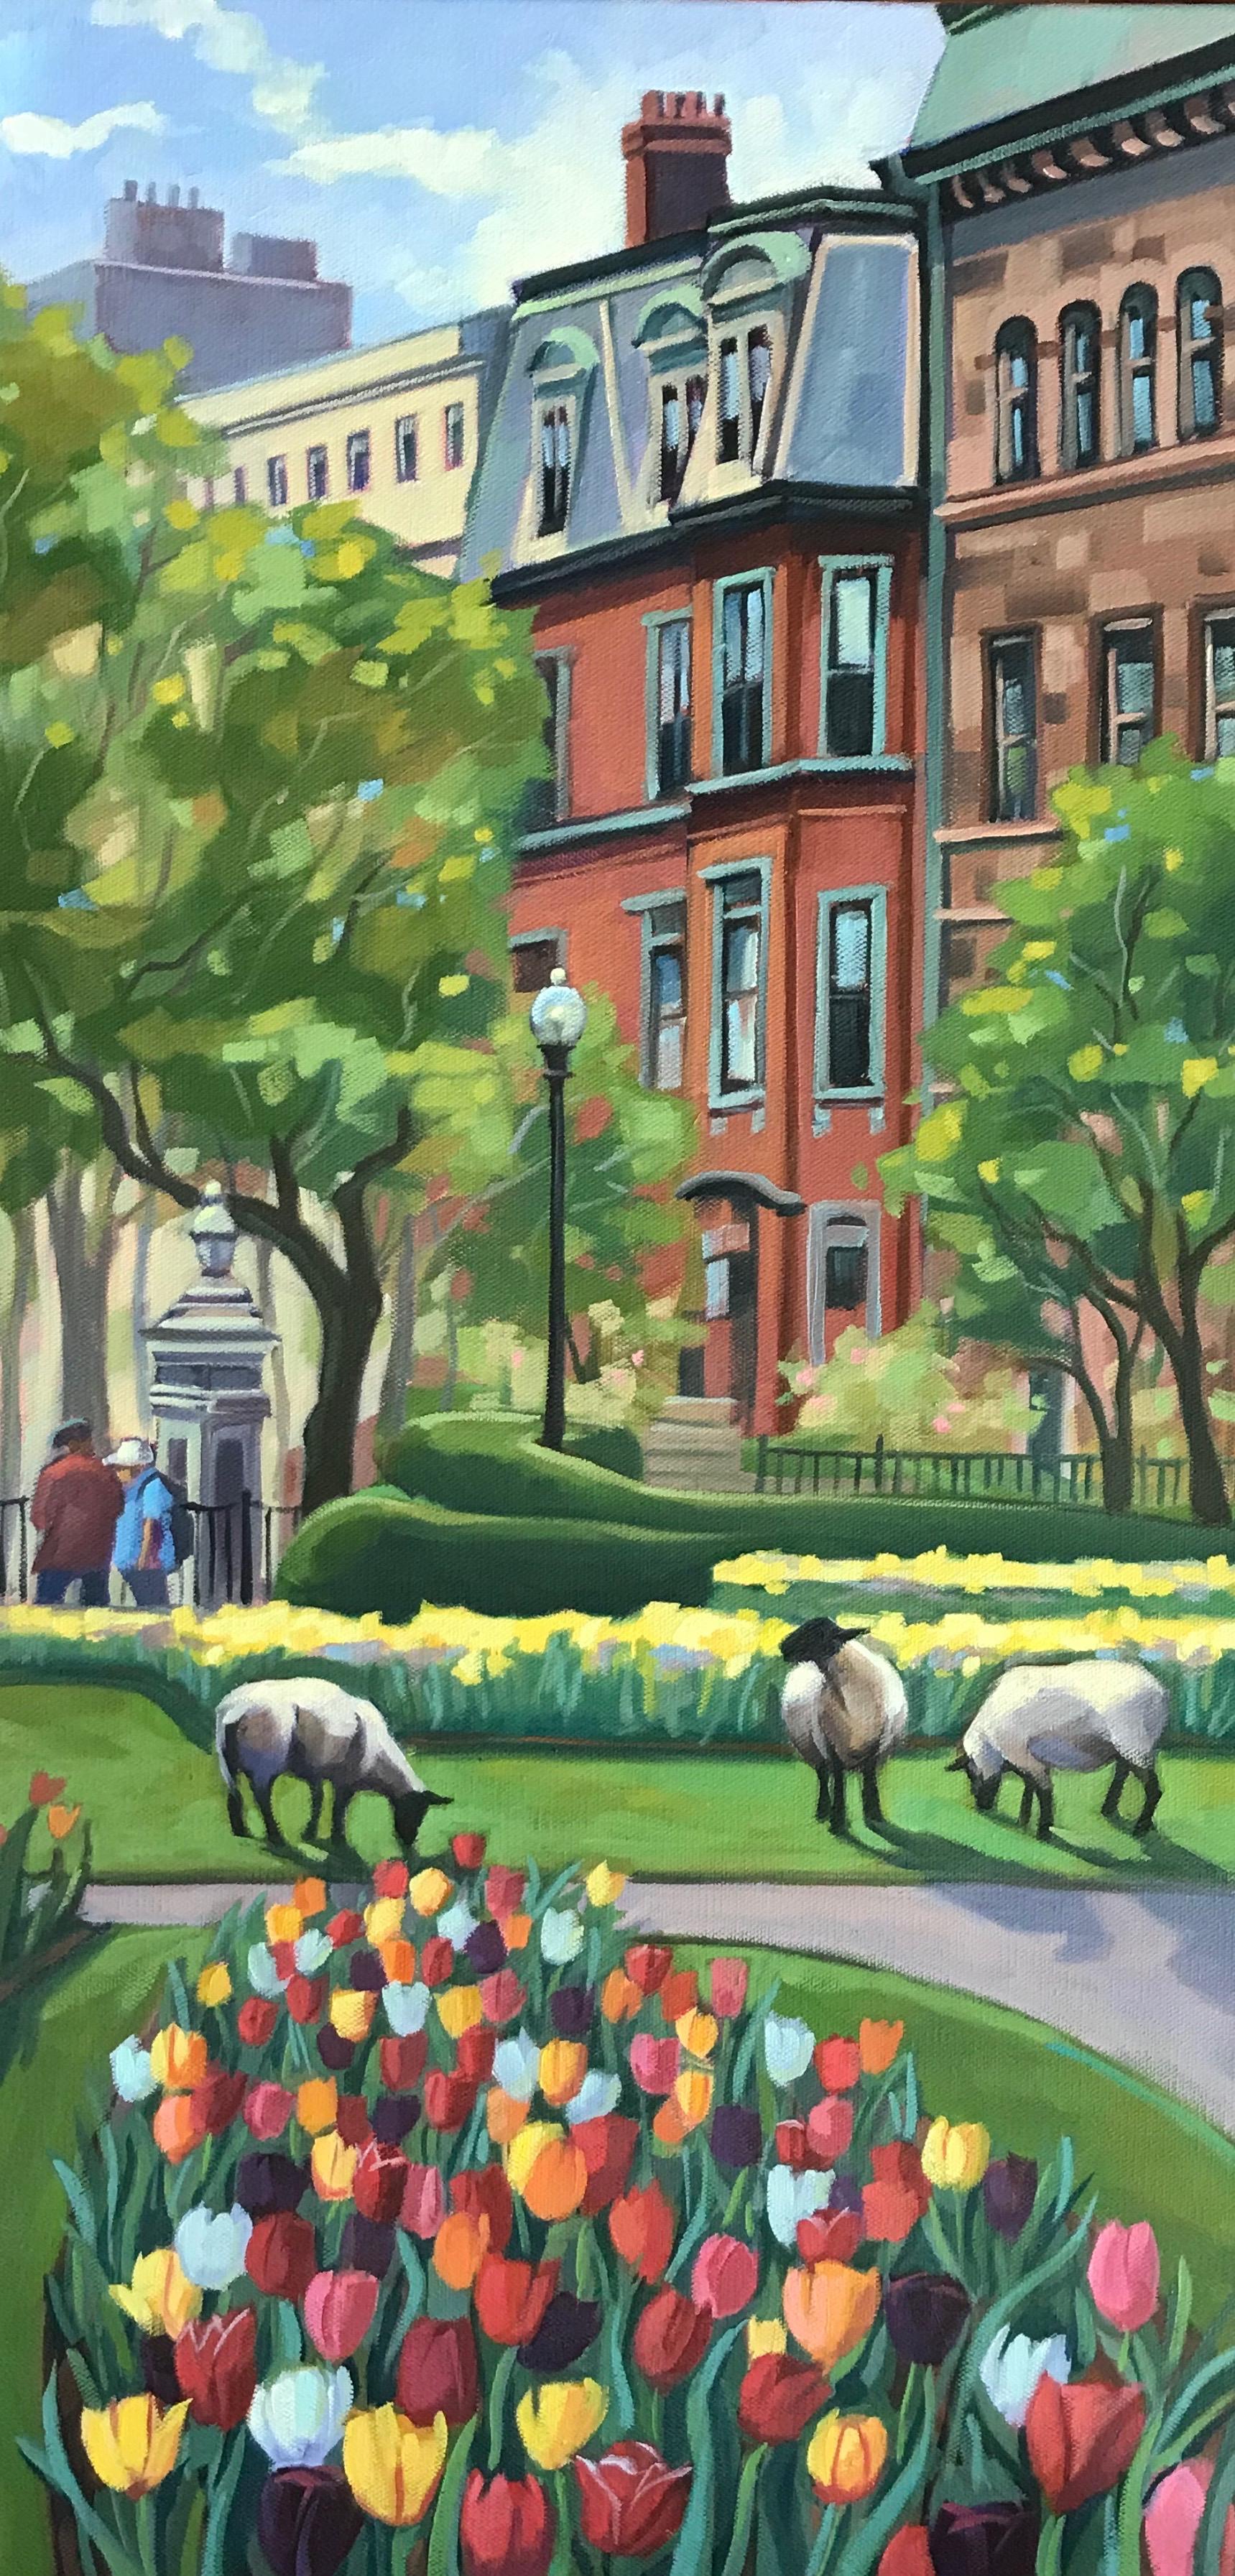 Springtime in Boston Public Garden